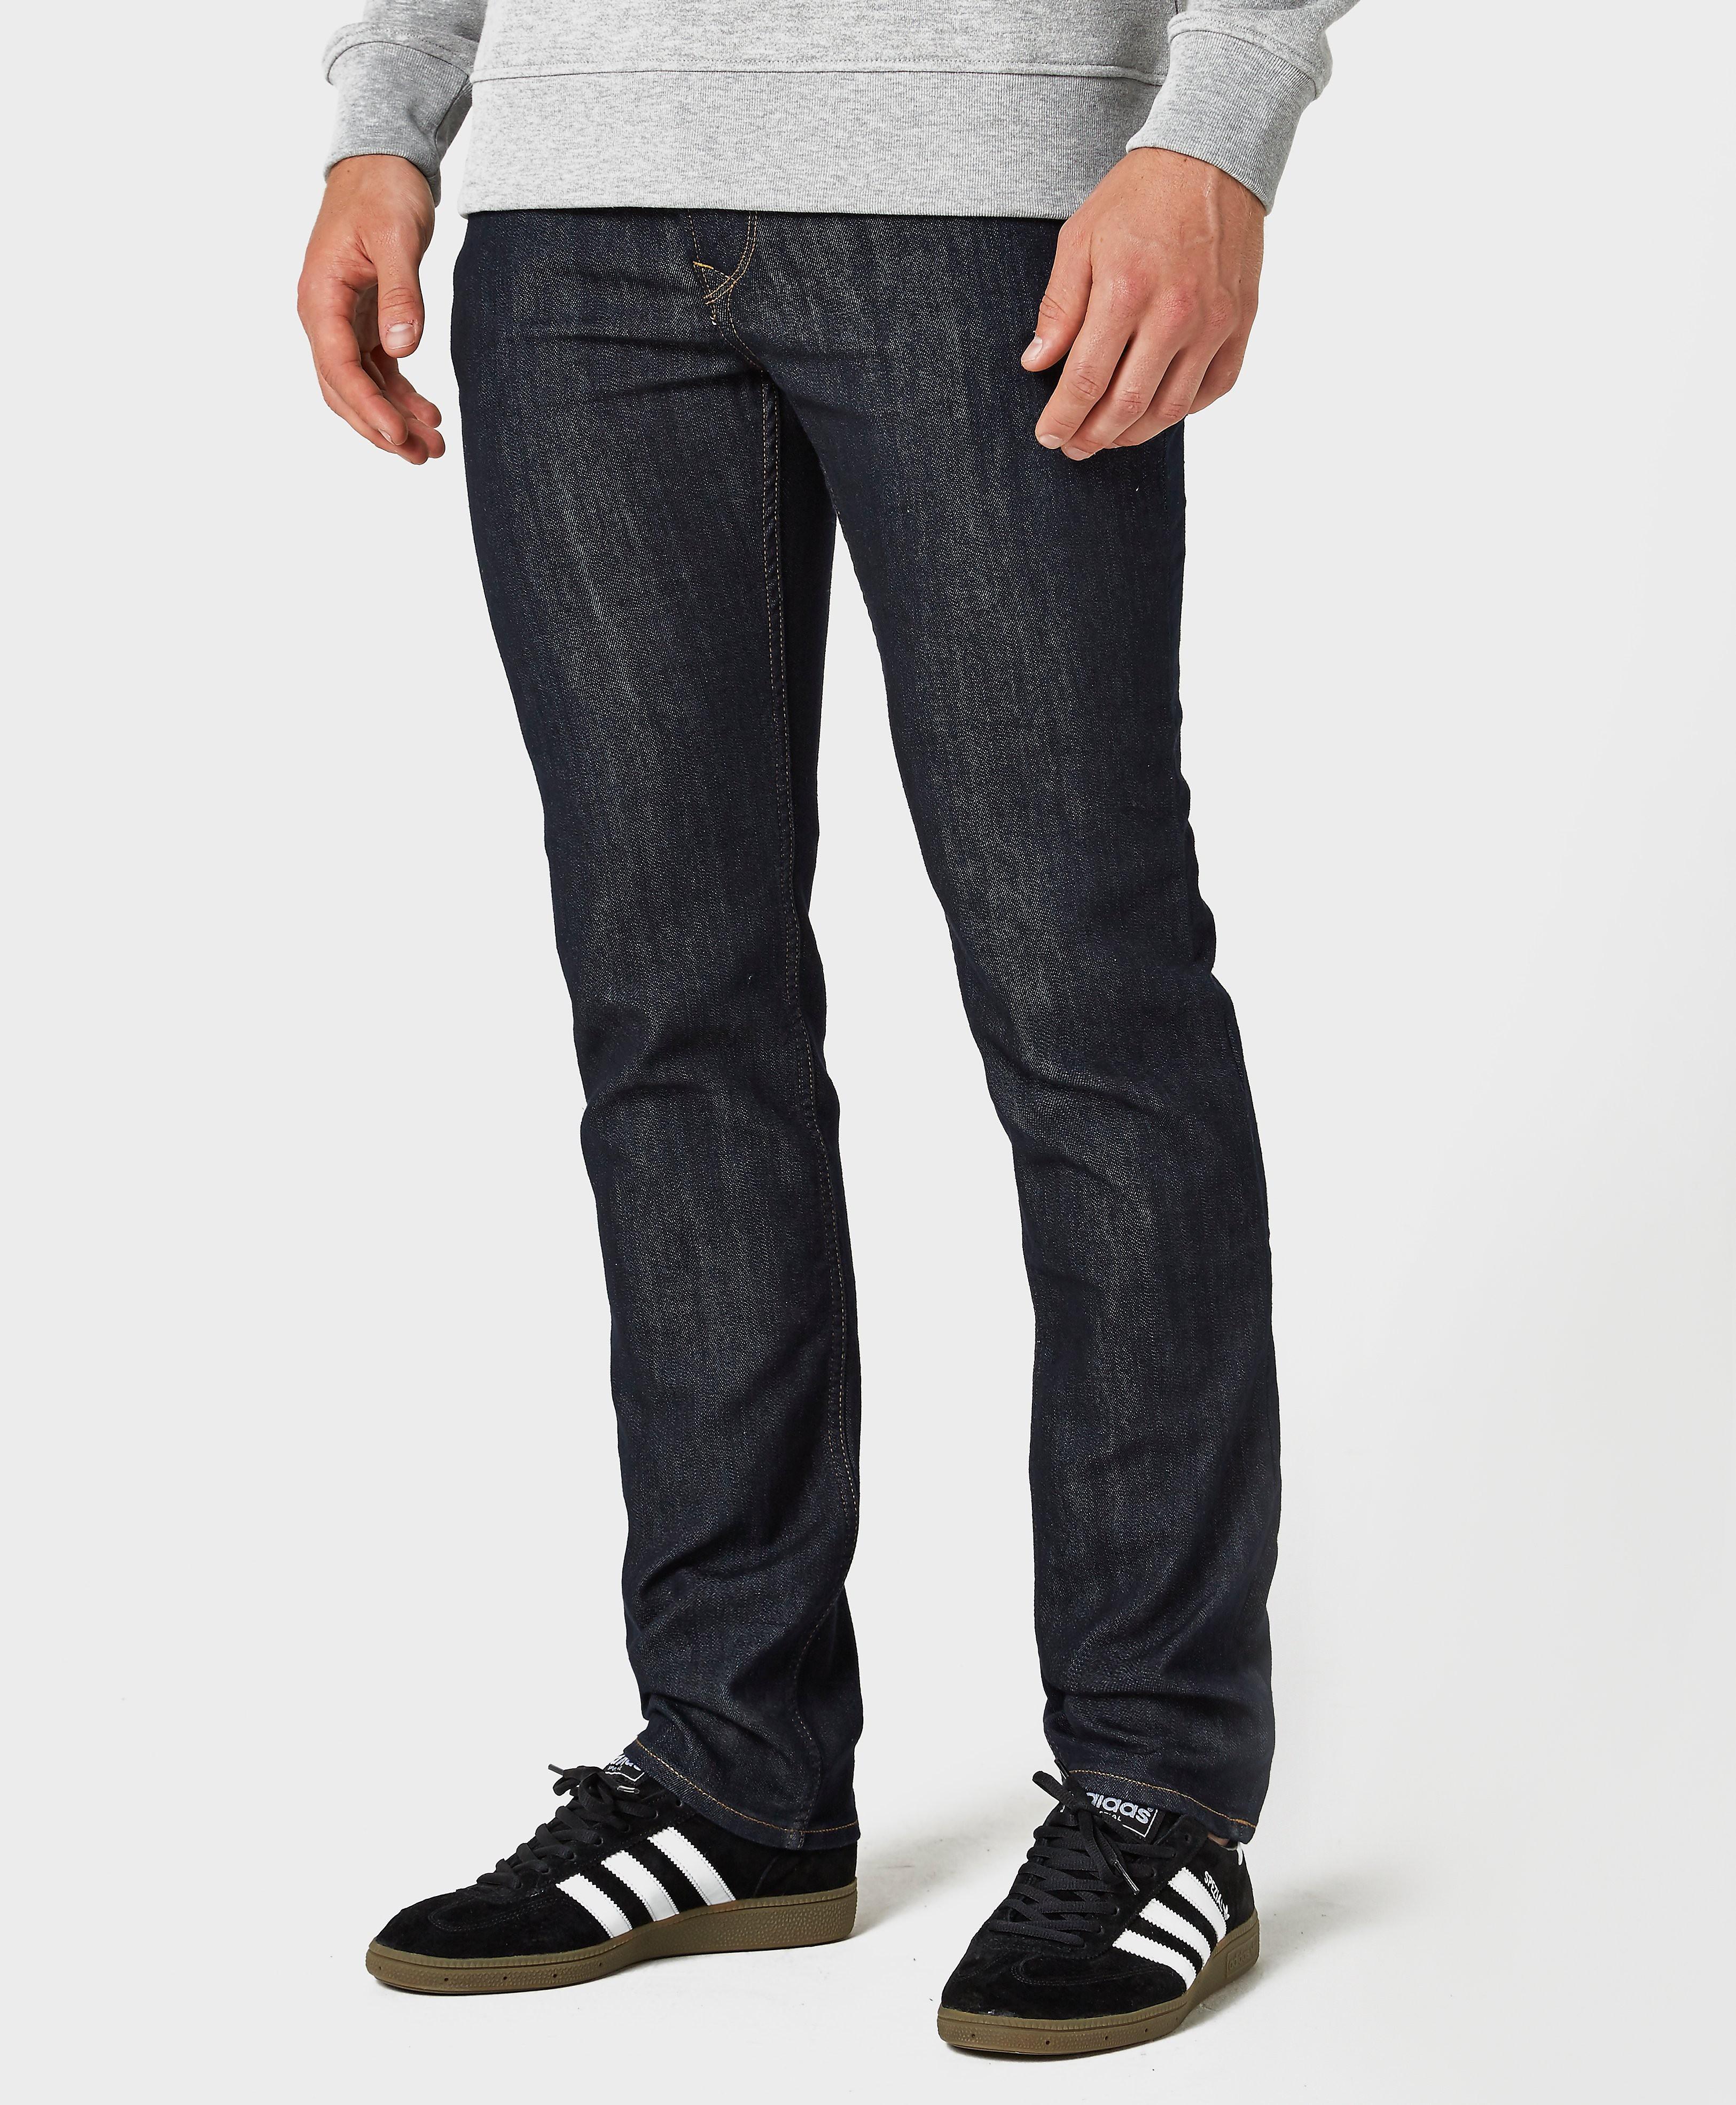 Lee Rider Regular Waist Slim Leg Jeans 'Rinse'